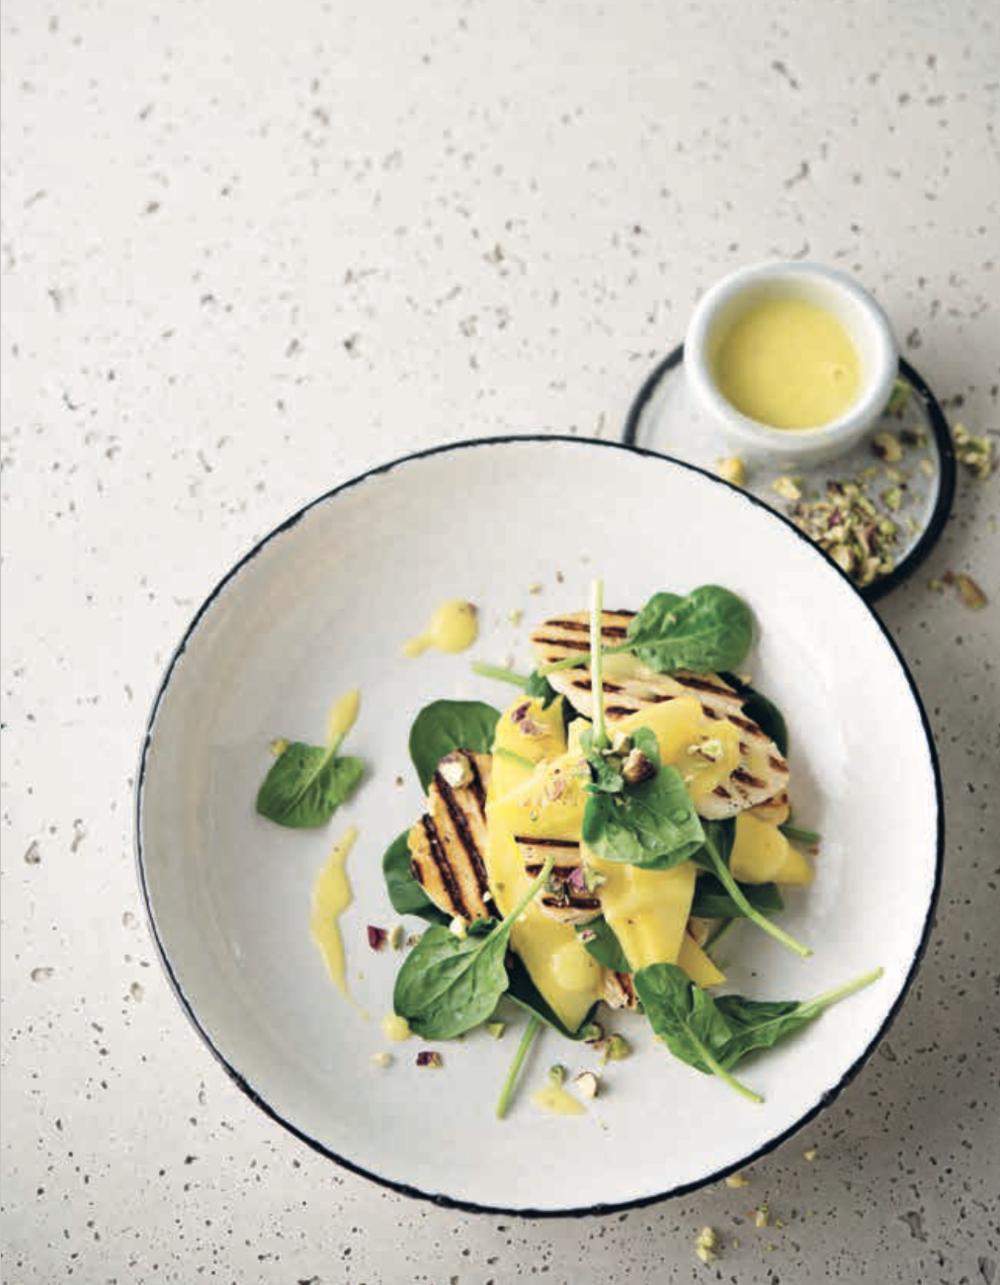 Salade de jeunes épinards à la mangue et au halloumi grillé • Spinach, mango and grilled halloumi salad